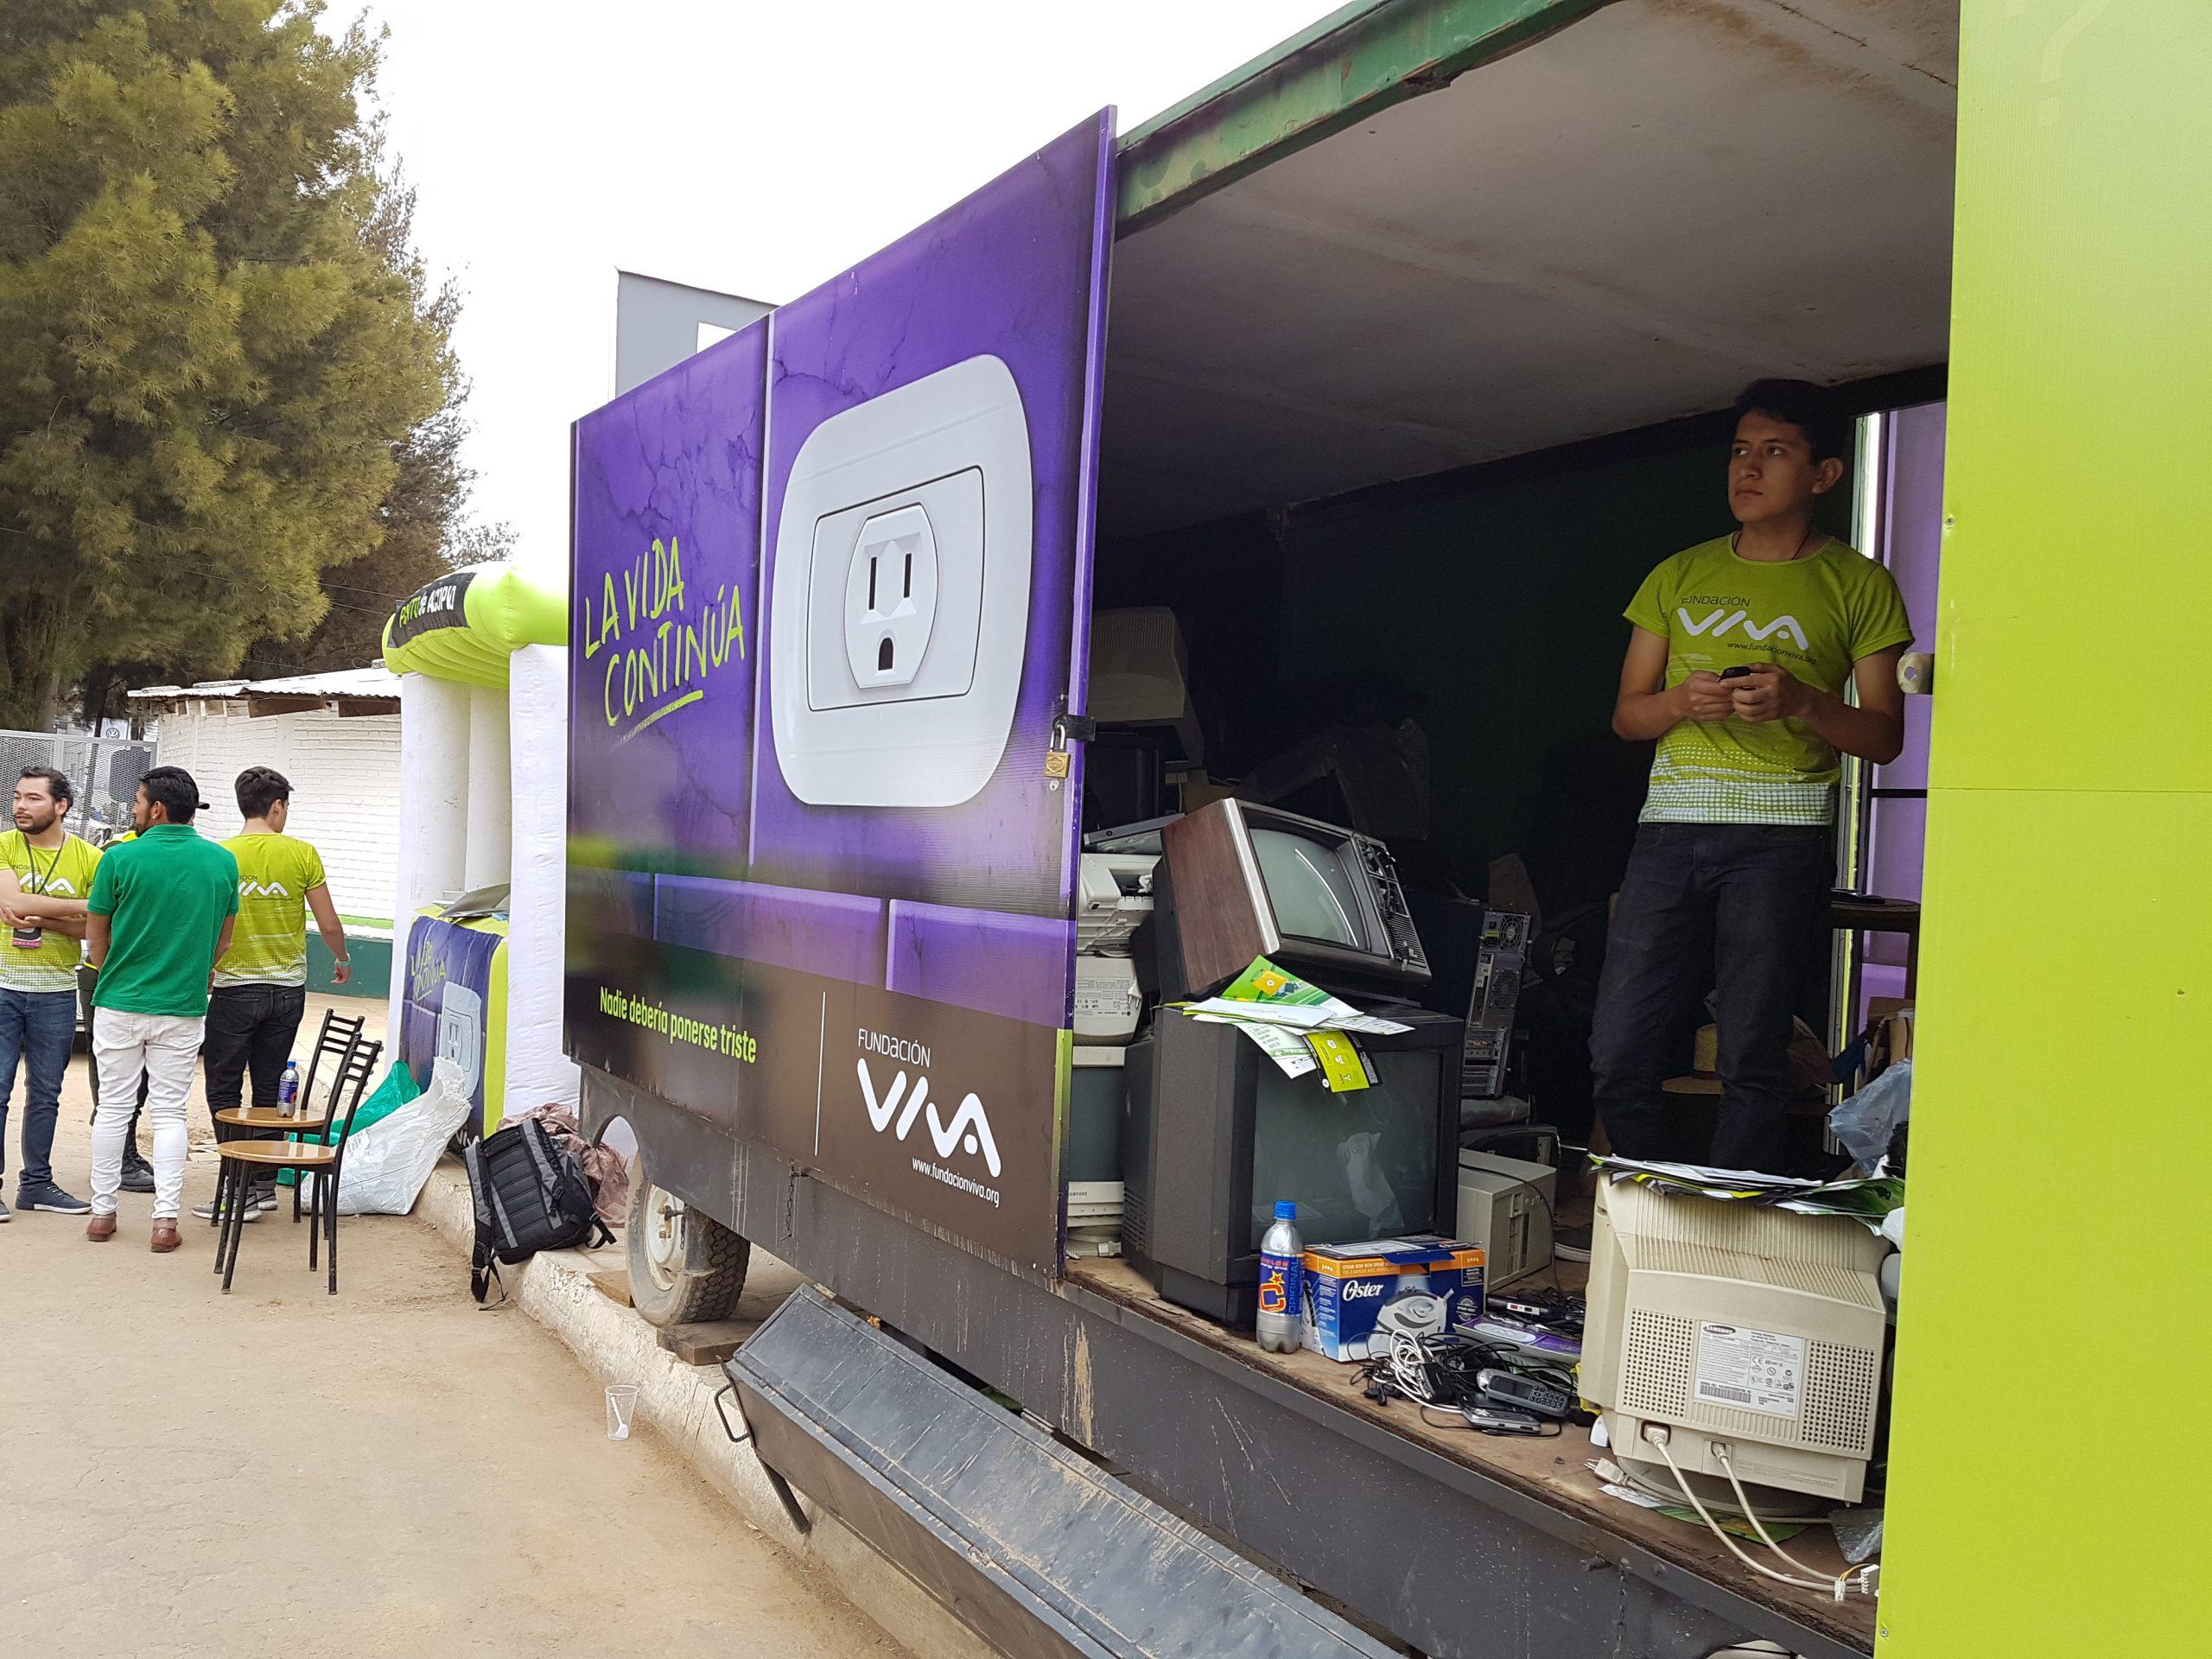 Residuos de aparatos electricos y electronicos RAEE scaled